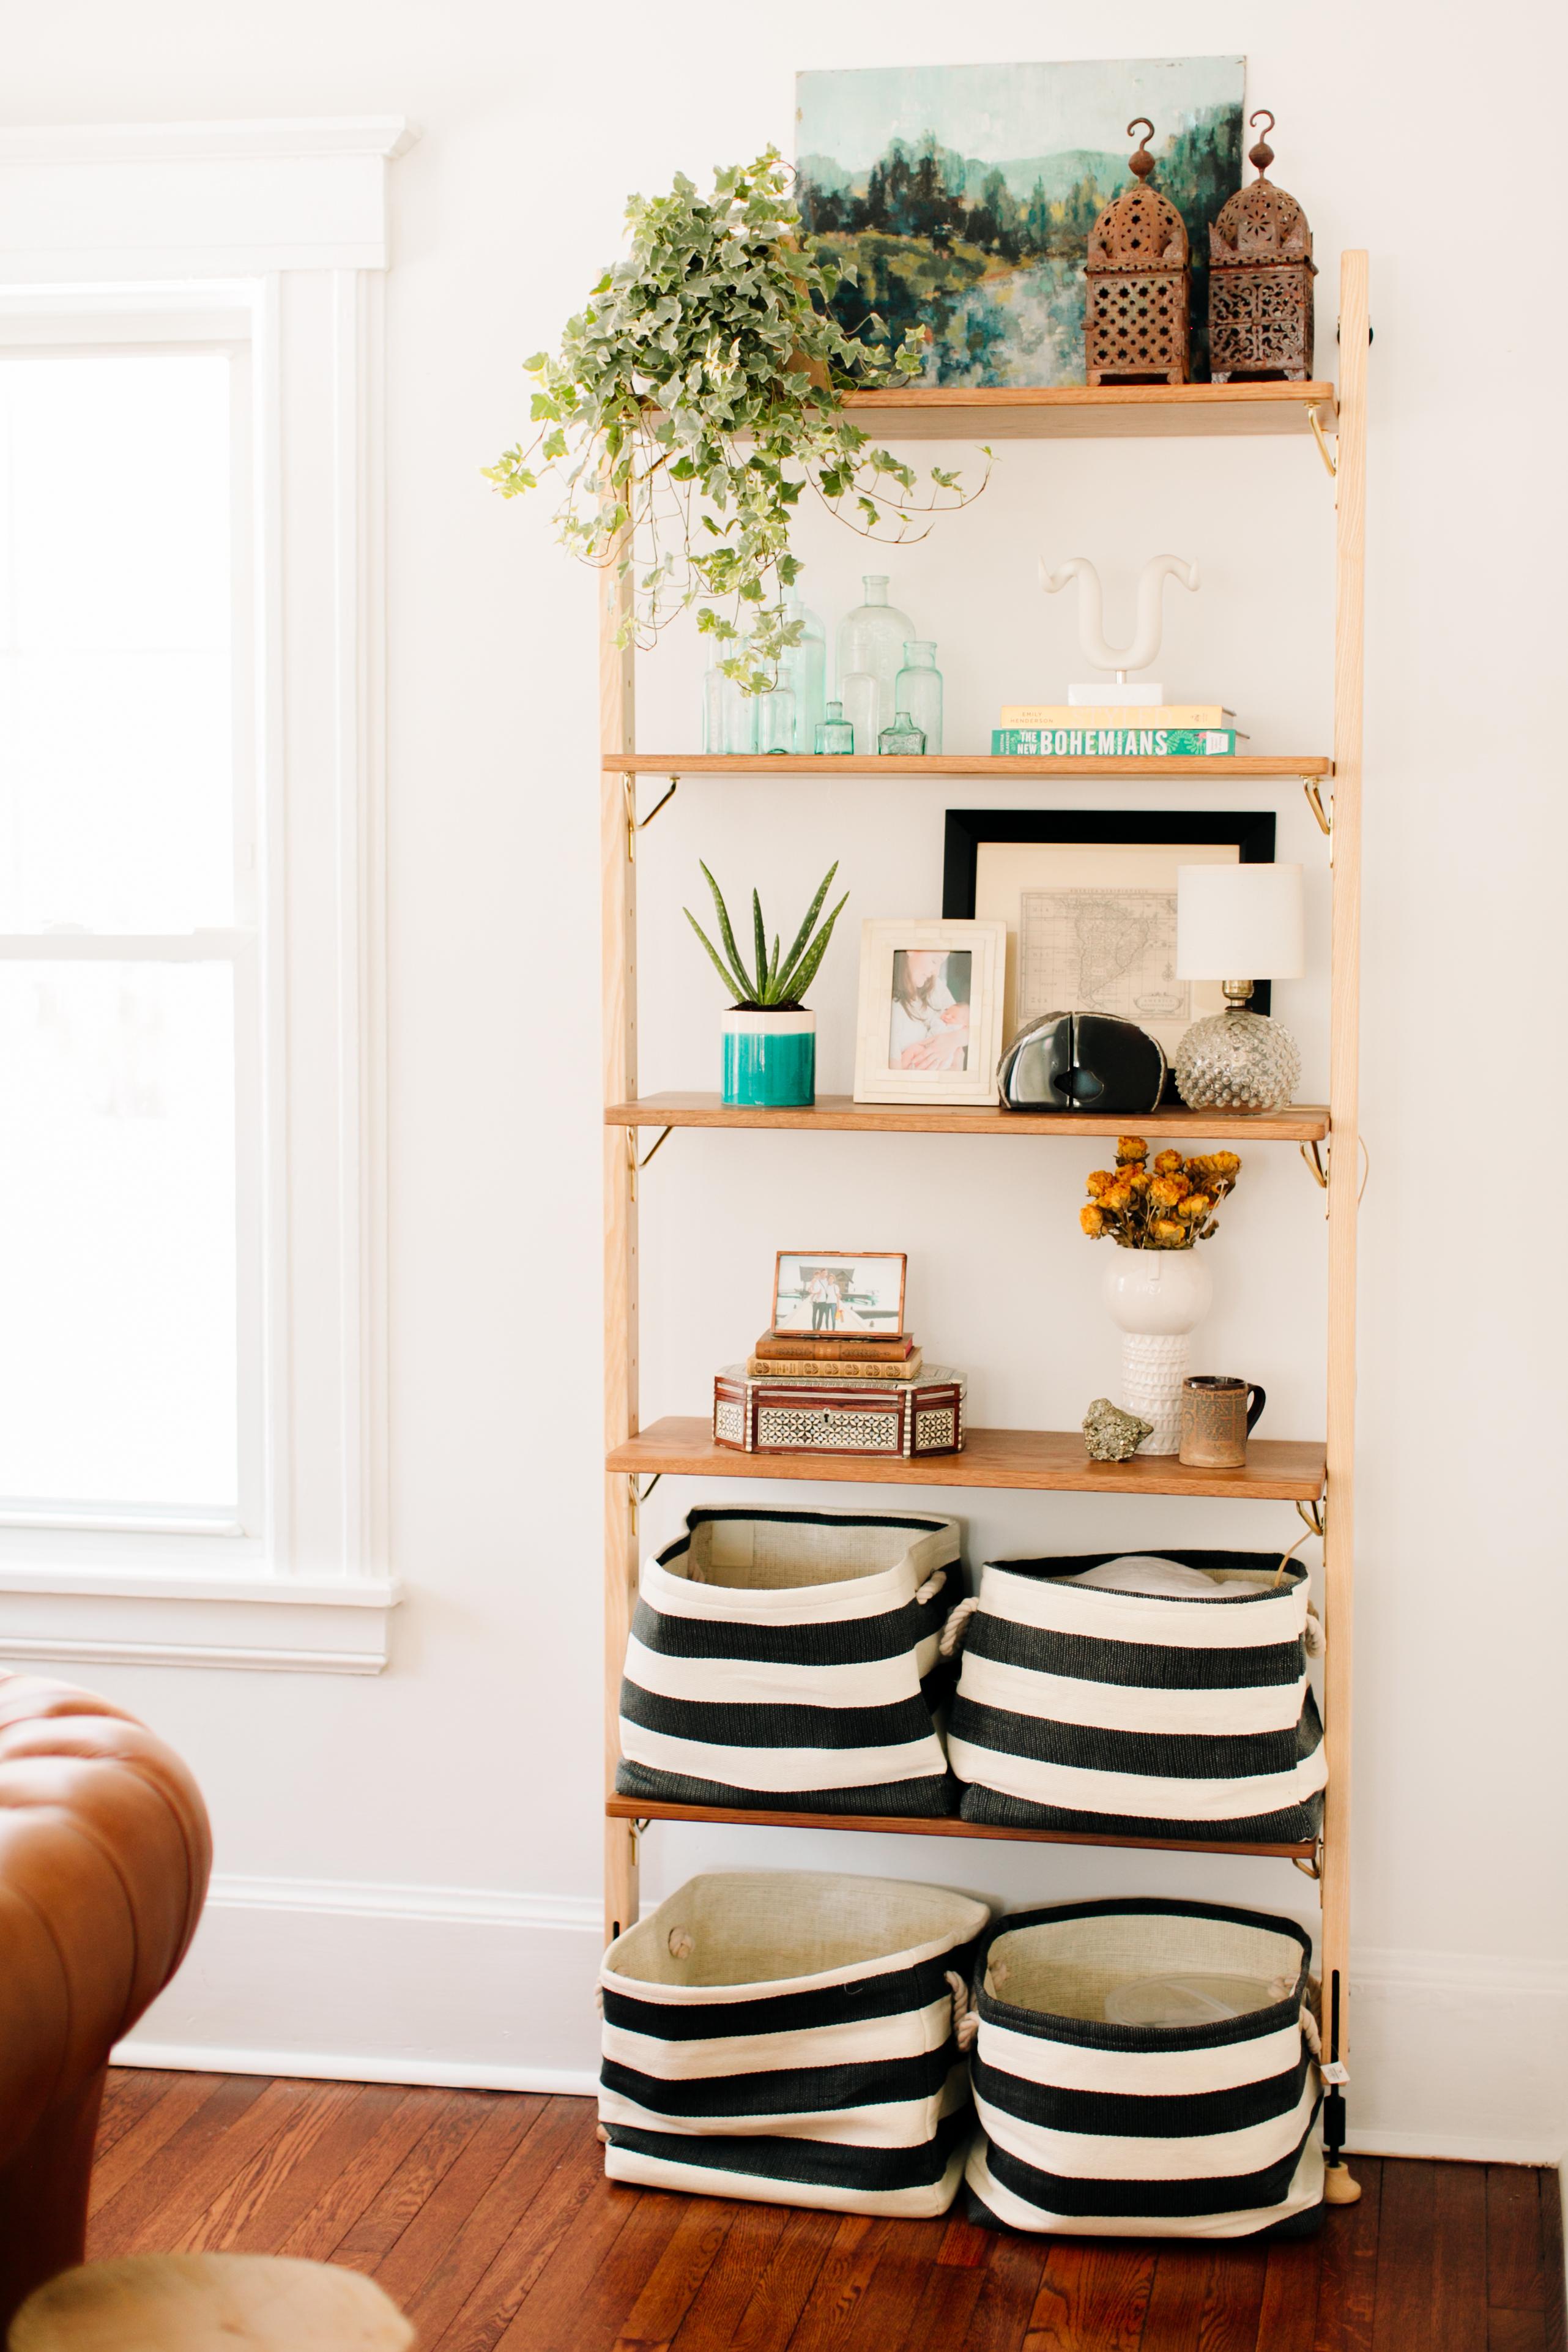 Basket storage in homeschooling area.